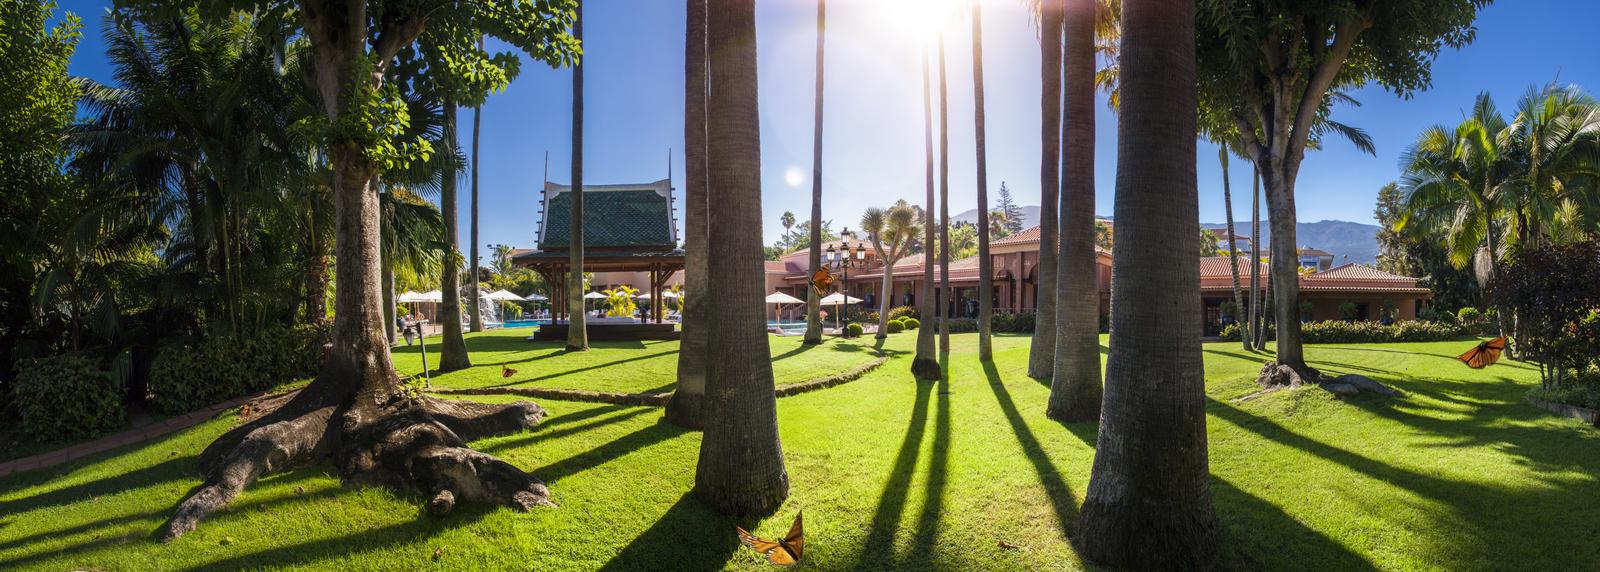 hotel-botanico-tenerife